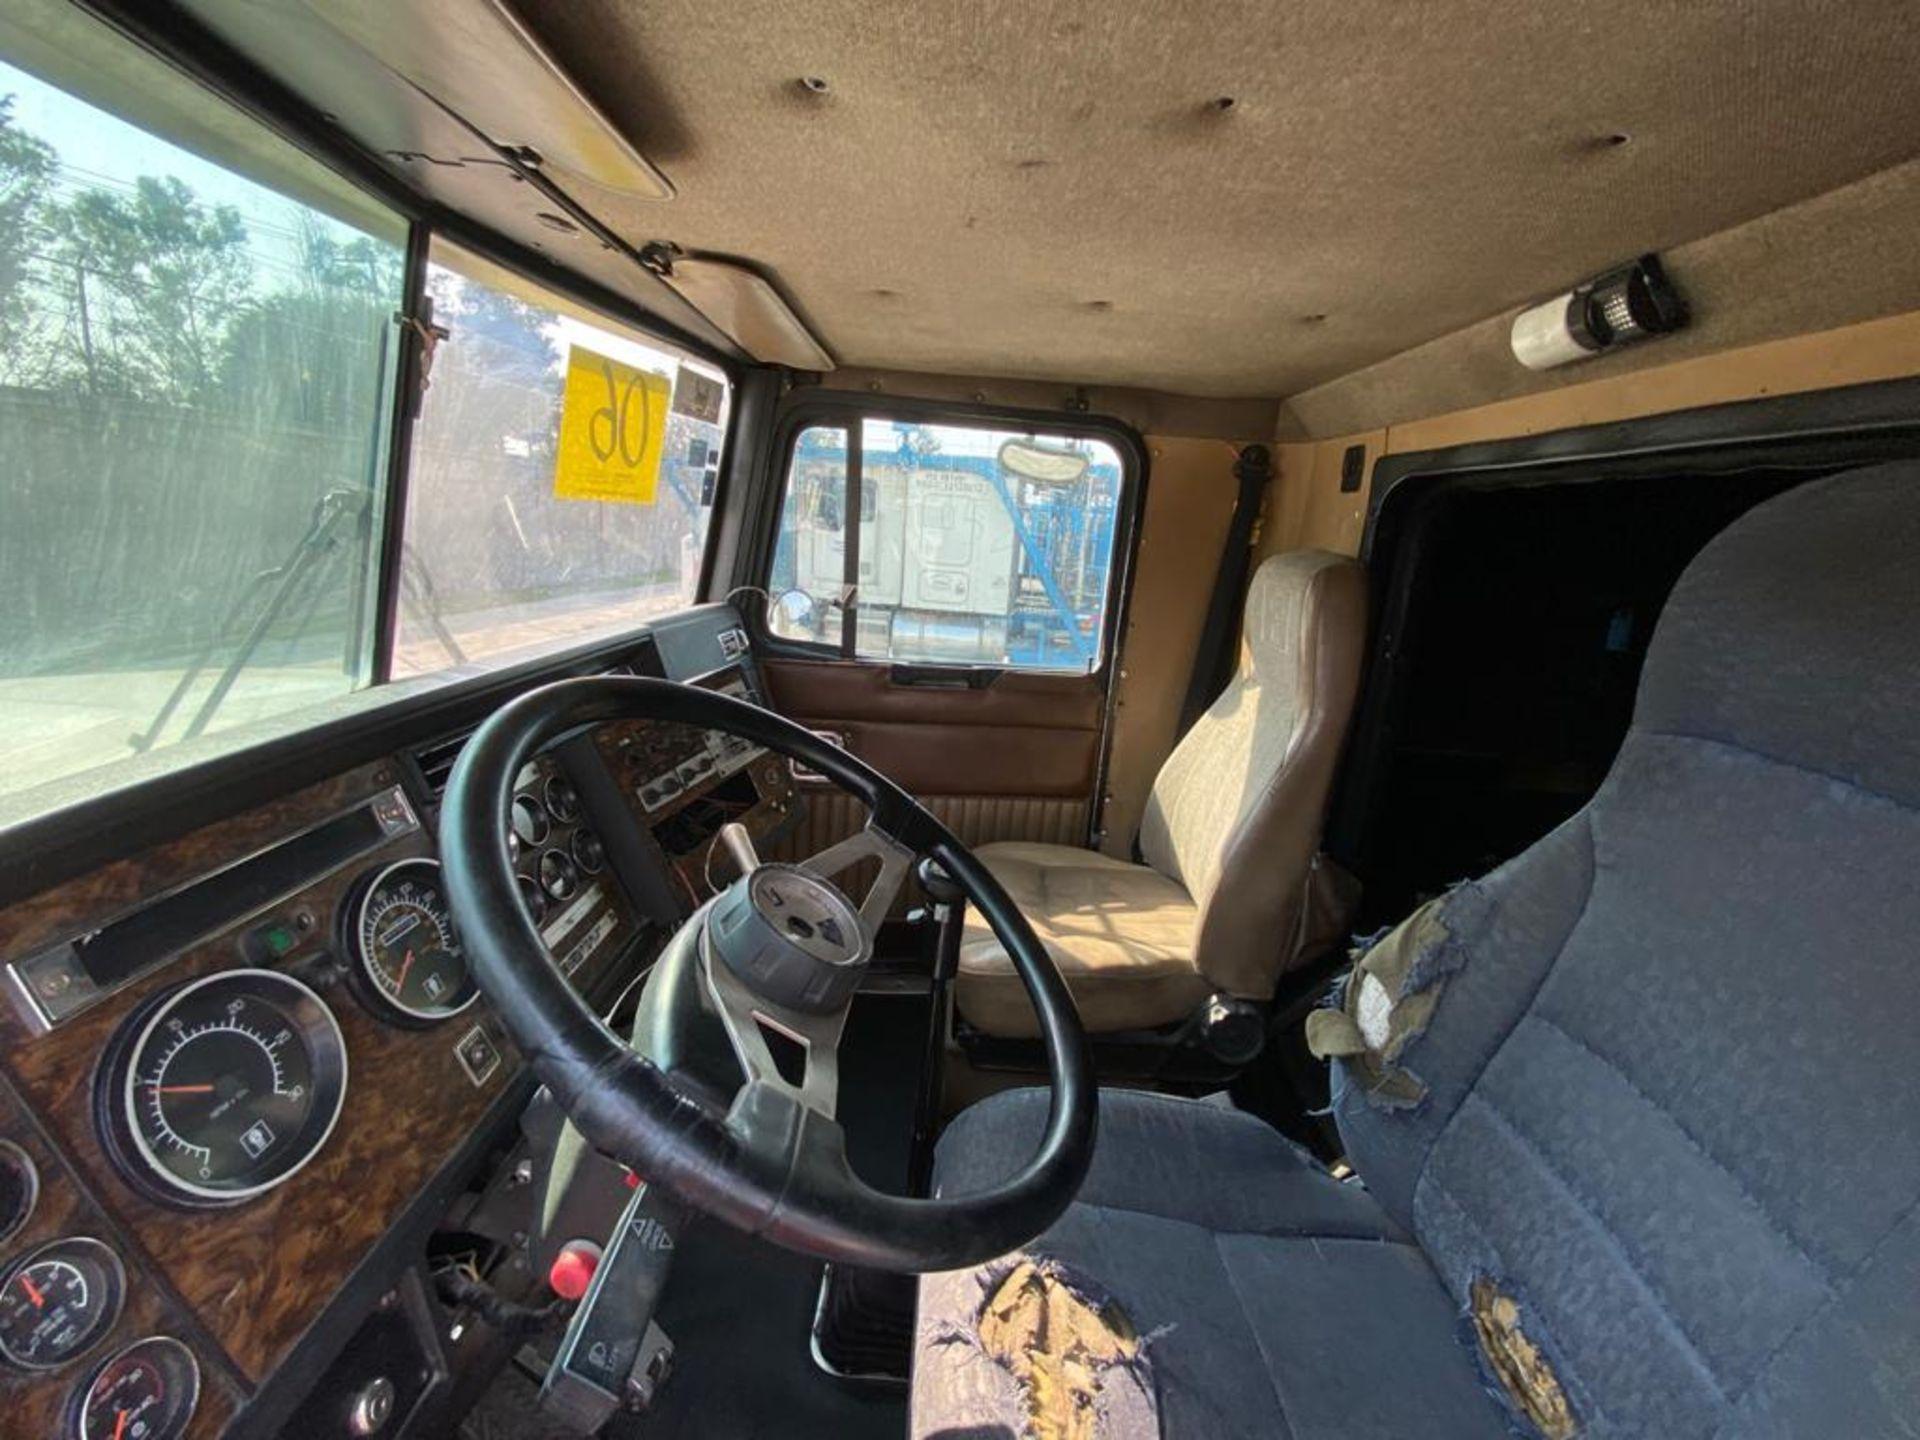 1998 Kenworth Sleeper truck tractor, standard transmission of 18 speeds - Image 44 of 75